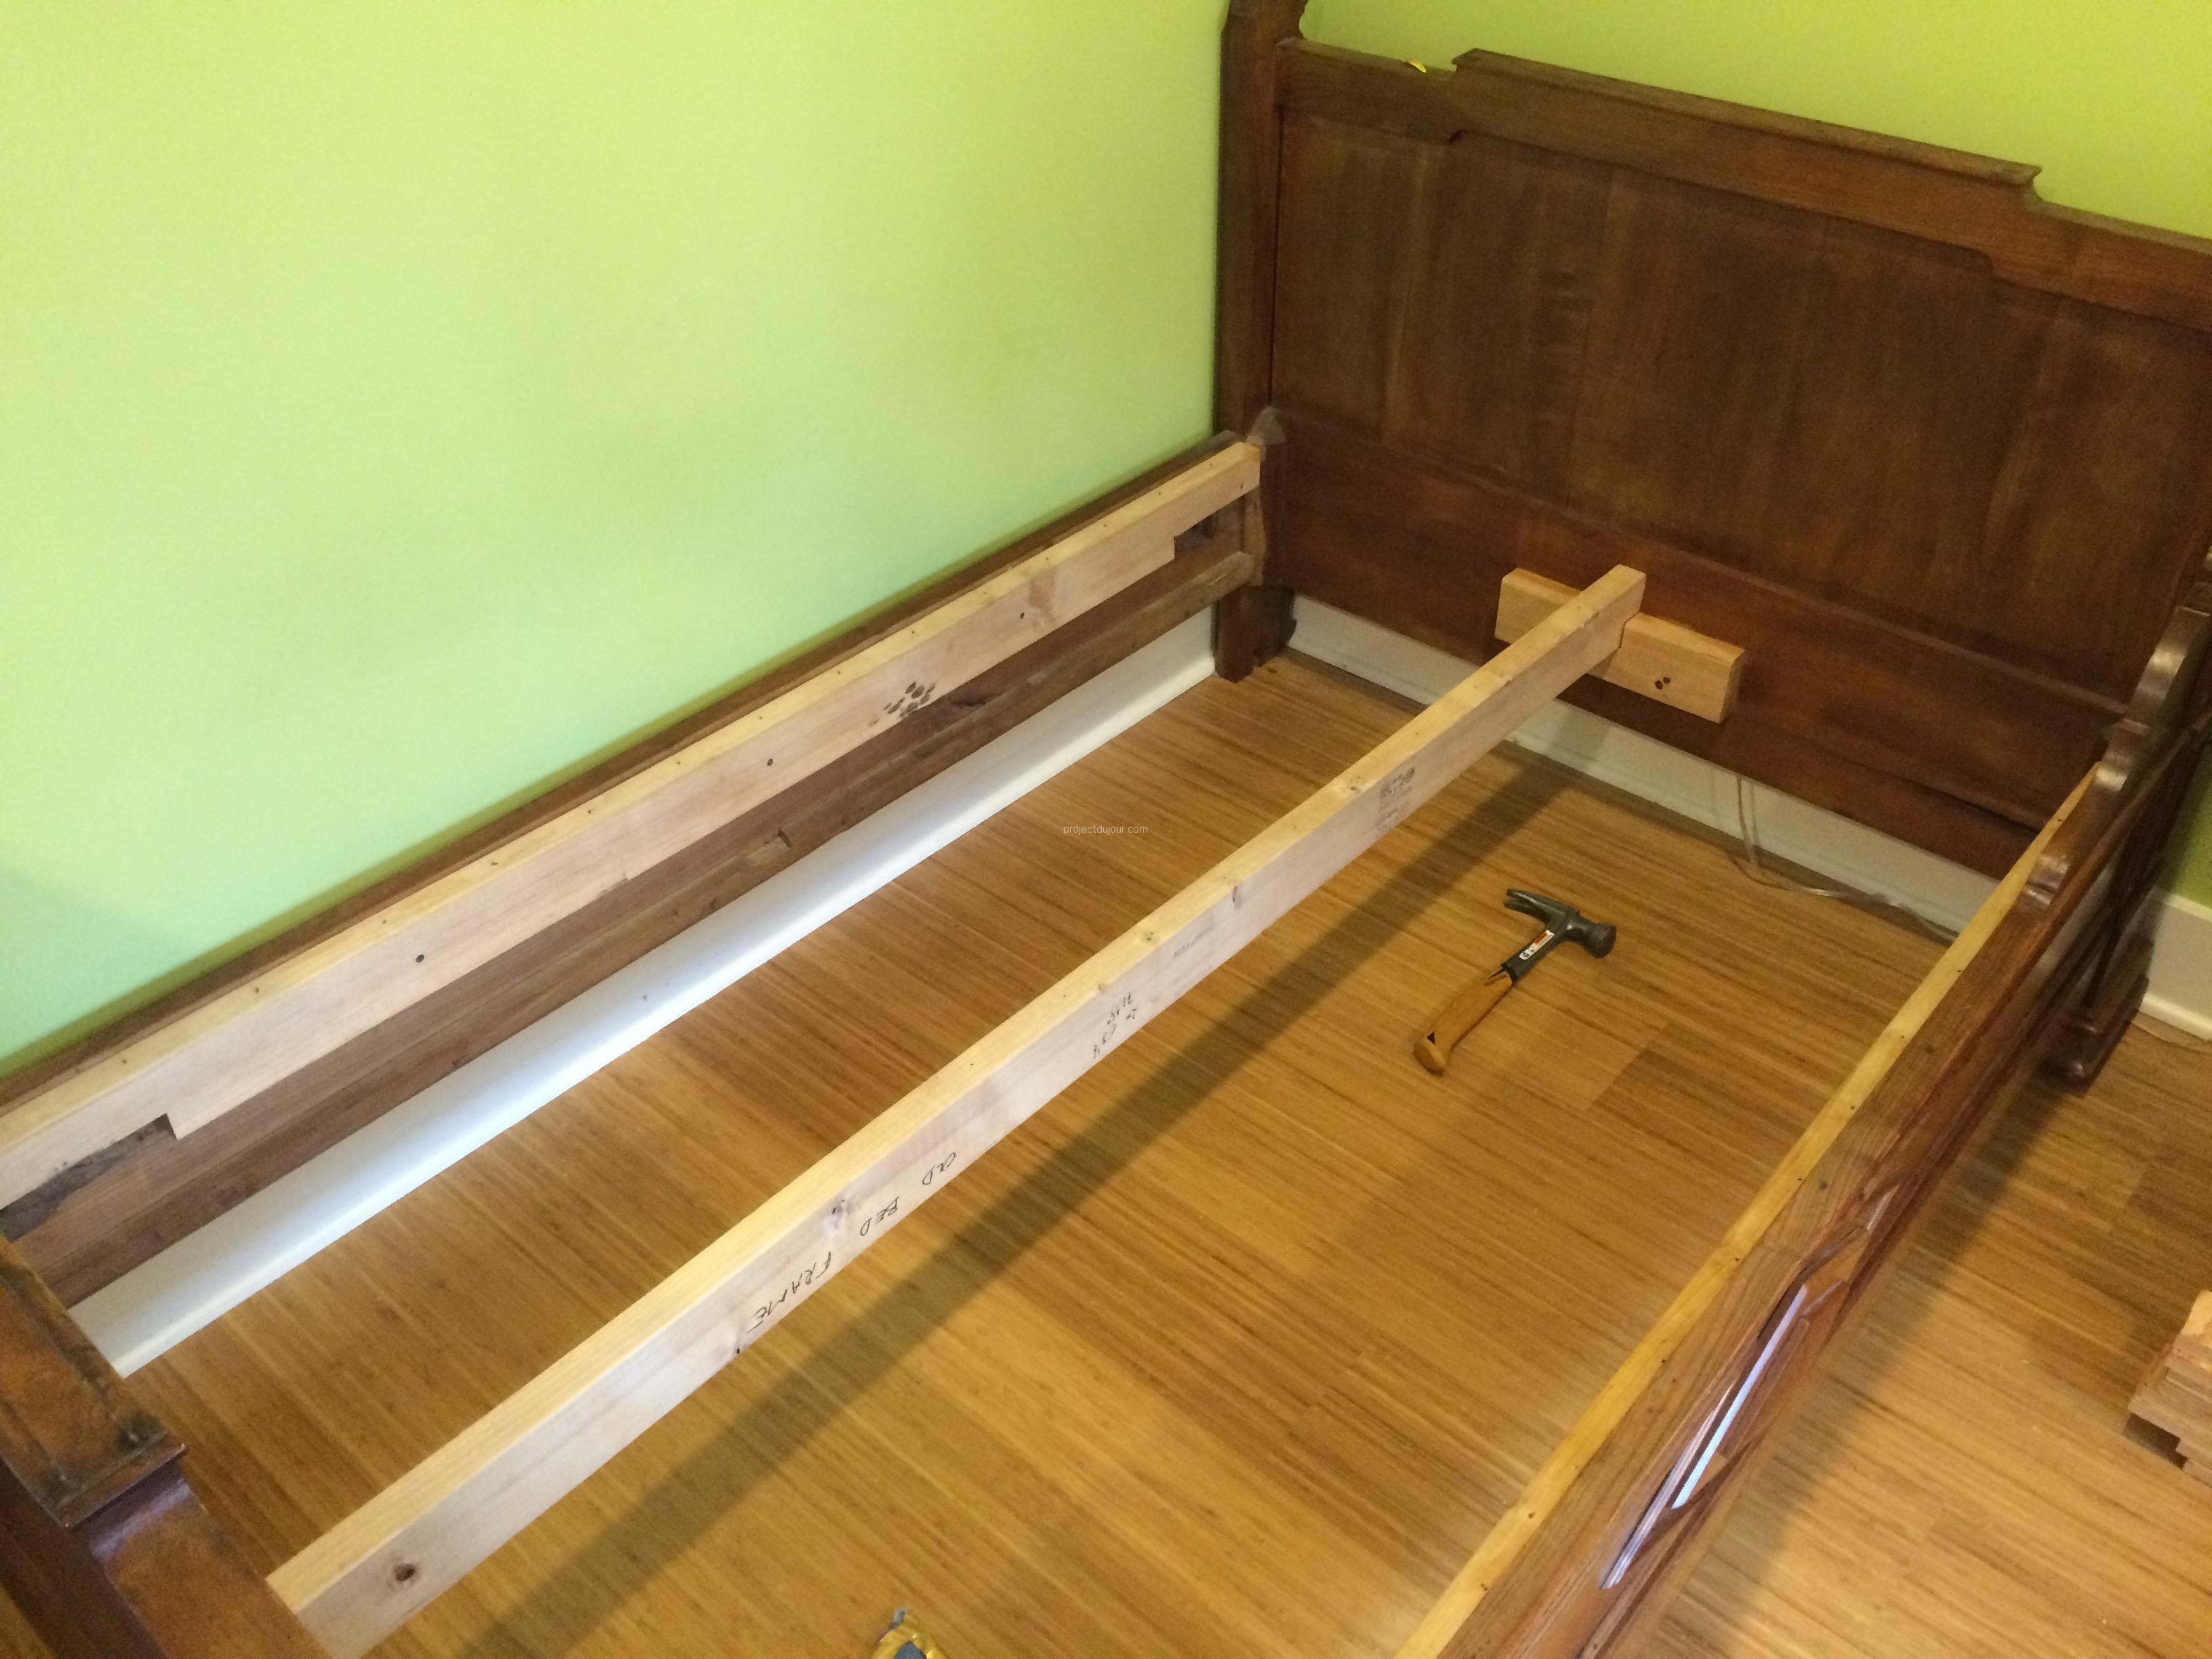 IKEA hack custom size slatted bed base Project du Jour